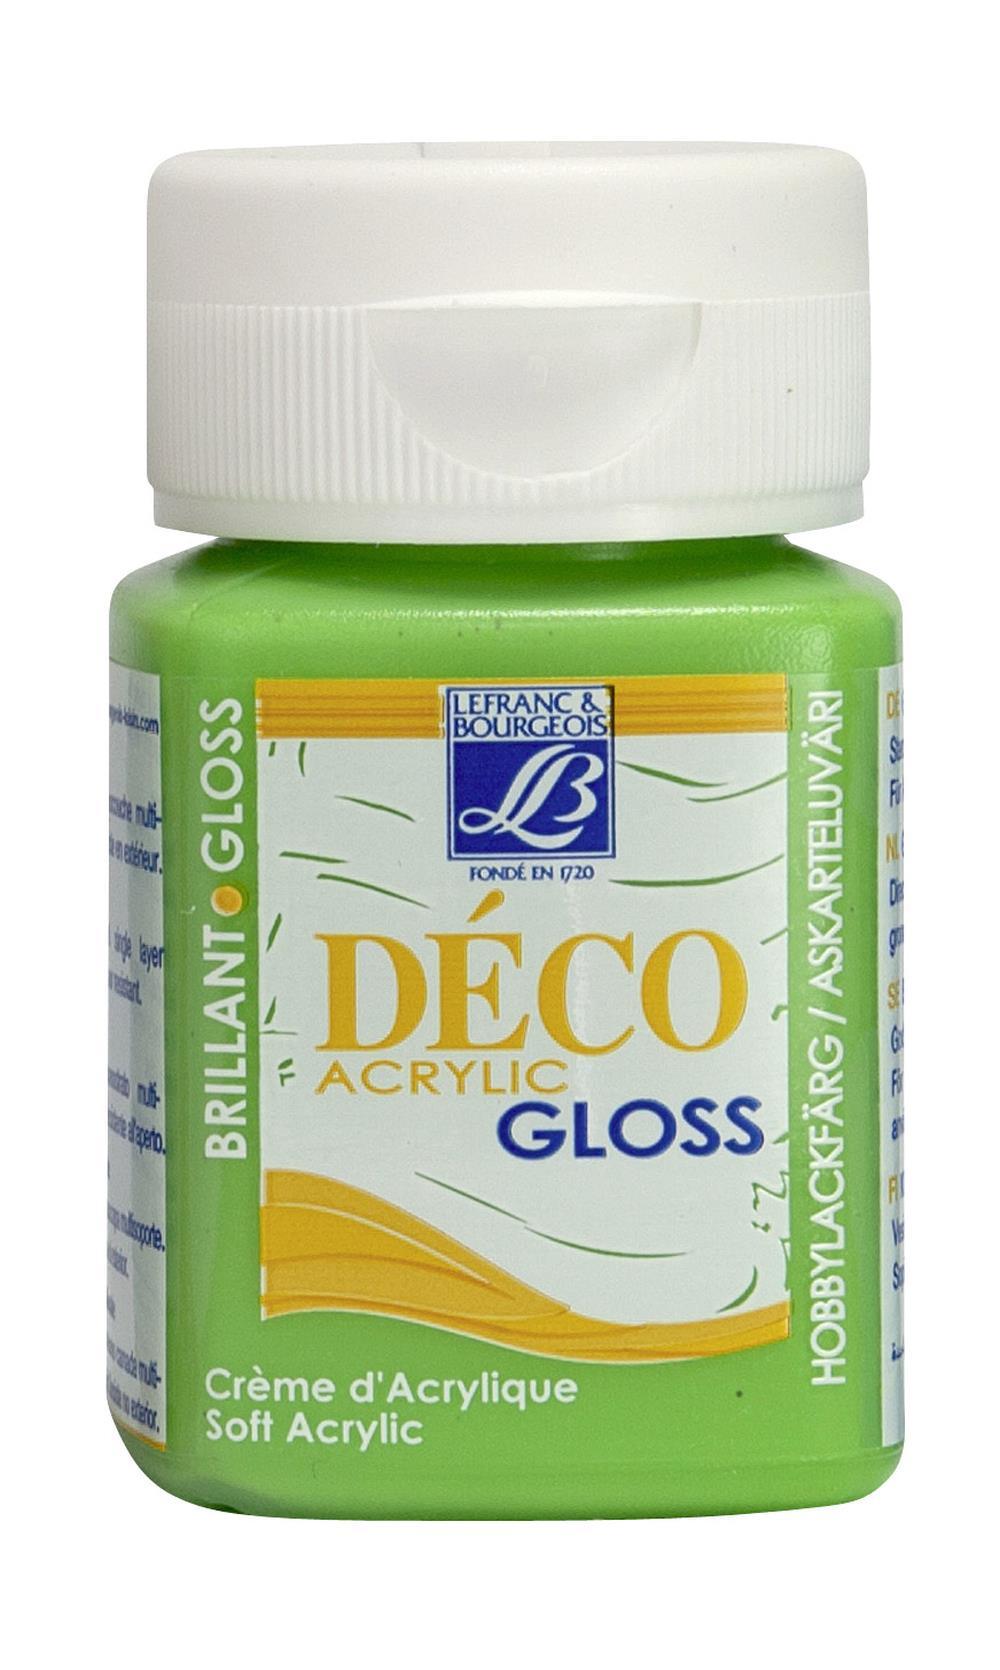 Hobbyfärg L&B Deco Gloss Akryl 50ml  Hazelnut 486 (4F) Utgår